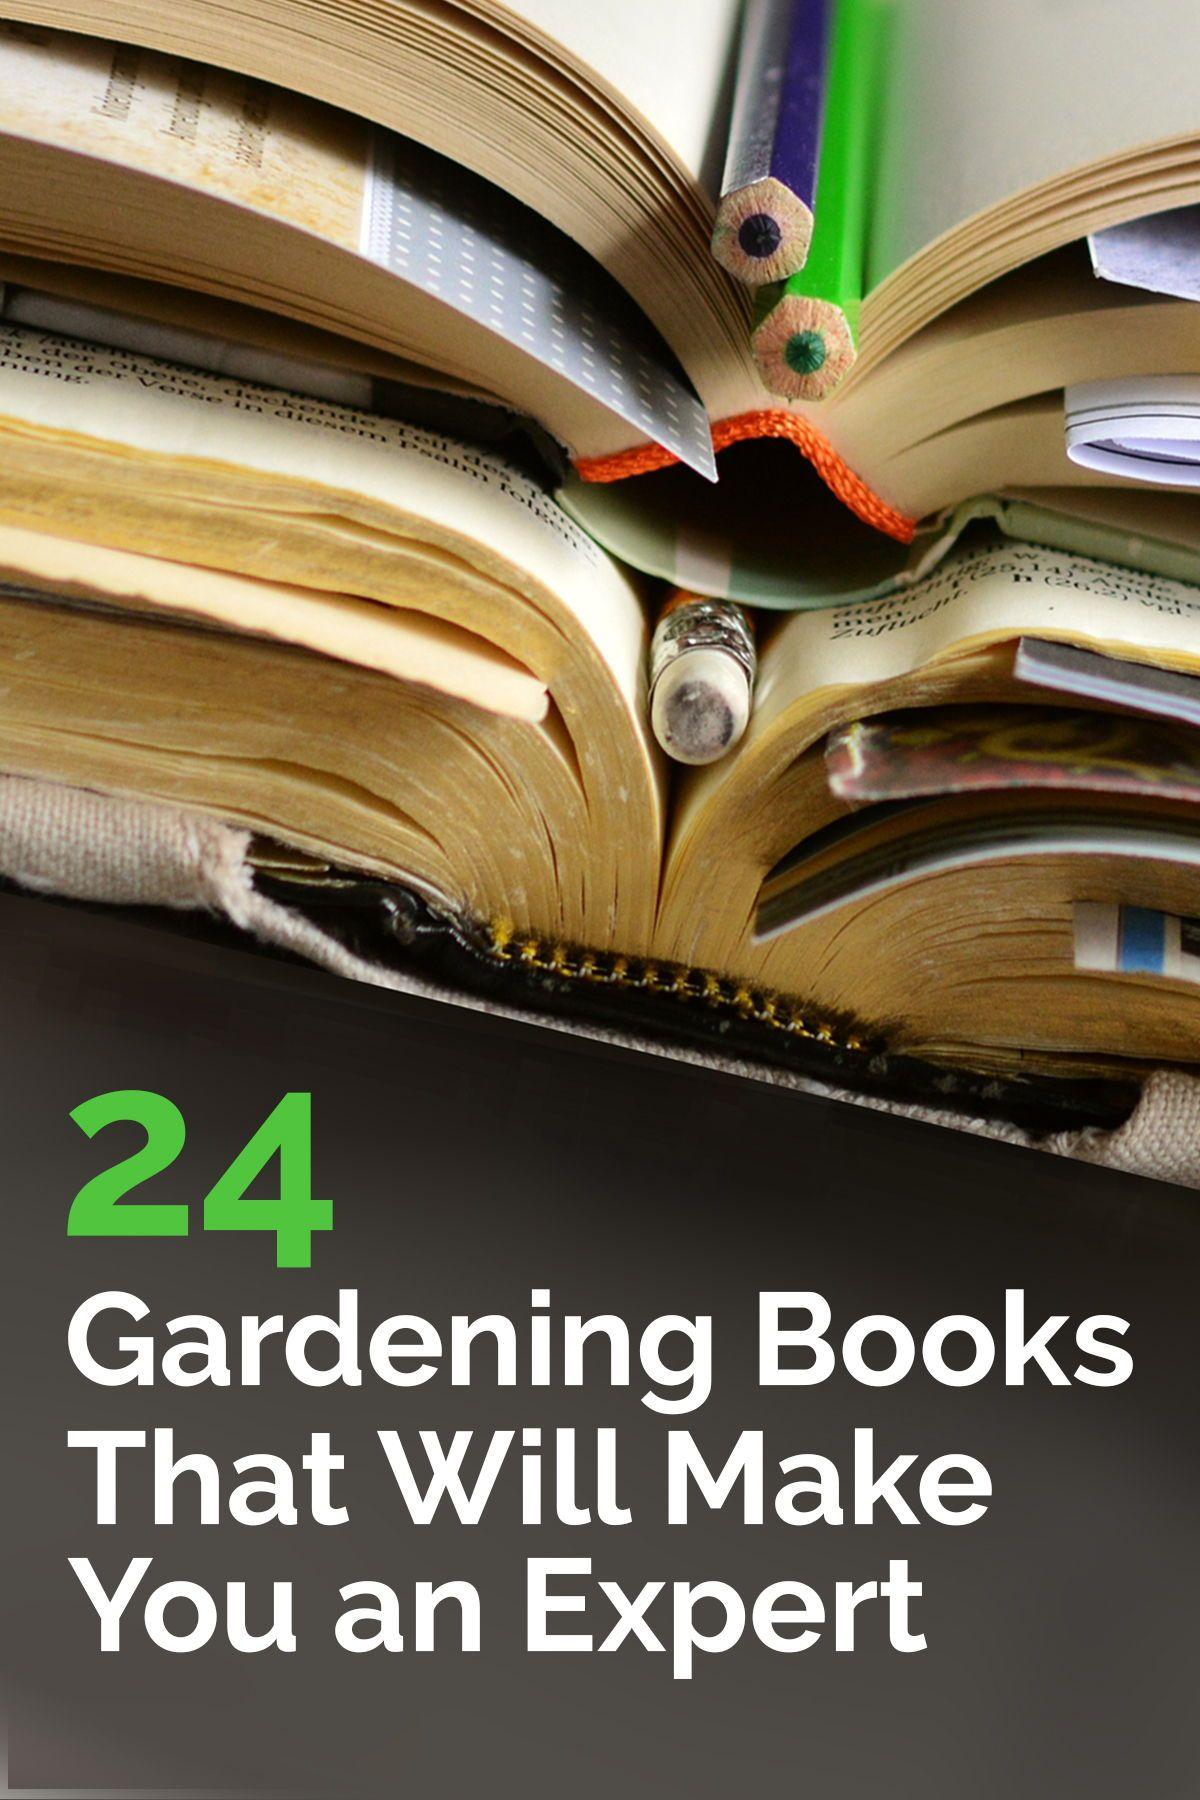 The Best Gardening Books For Beginners In 2020 Gardening Books Good Books Gardening For Beginners